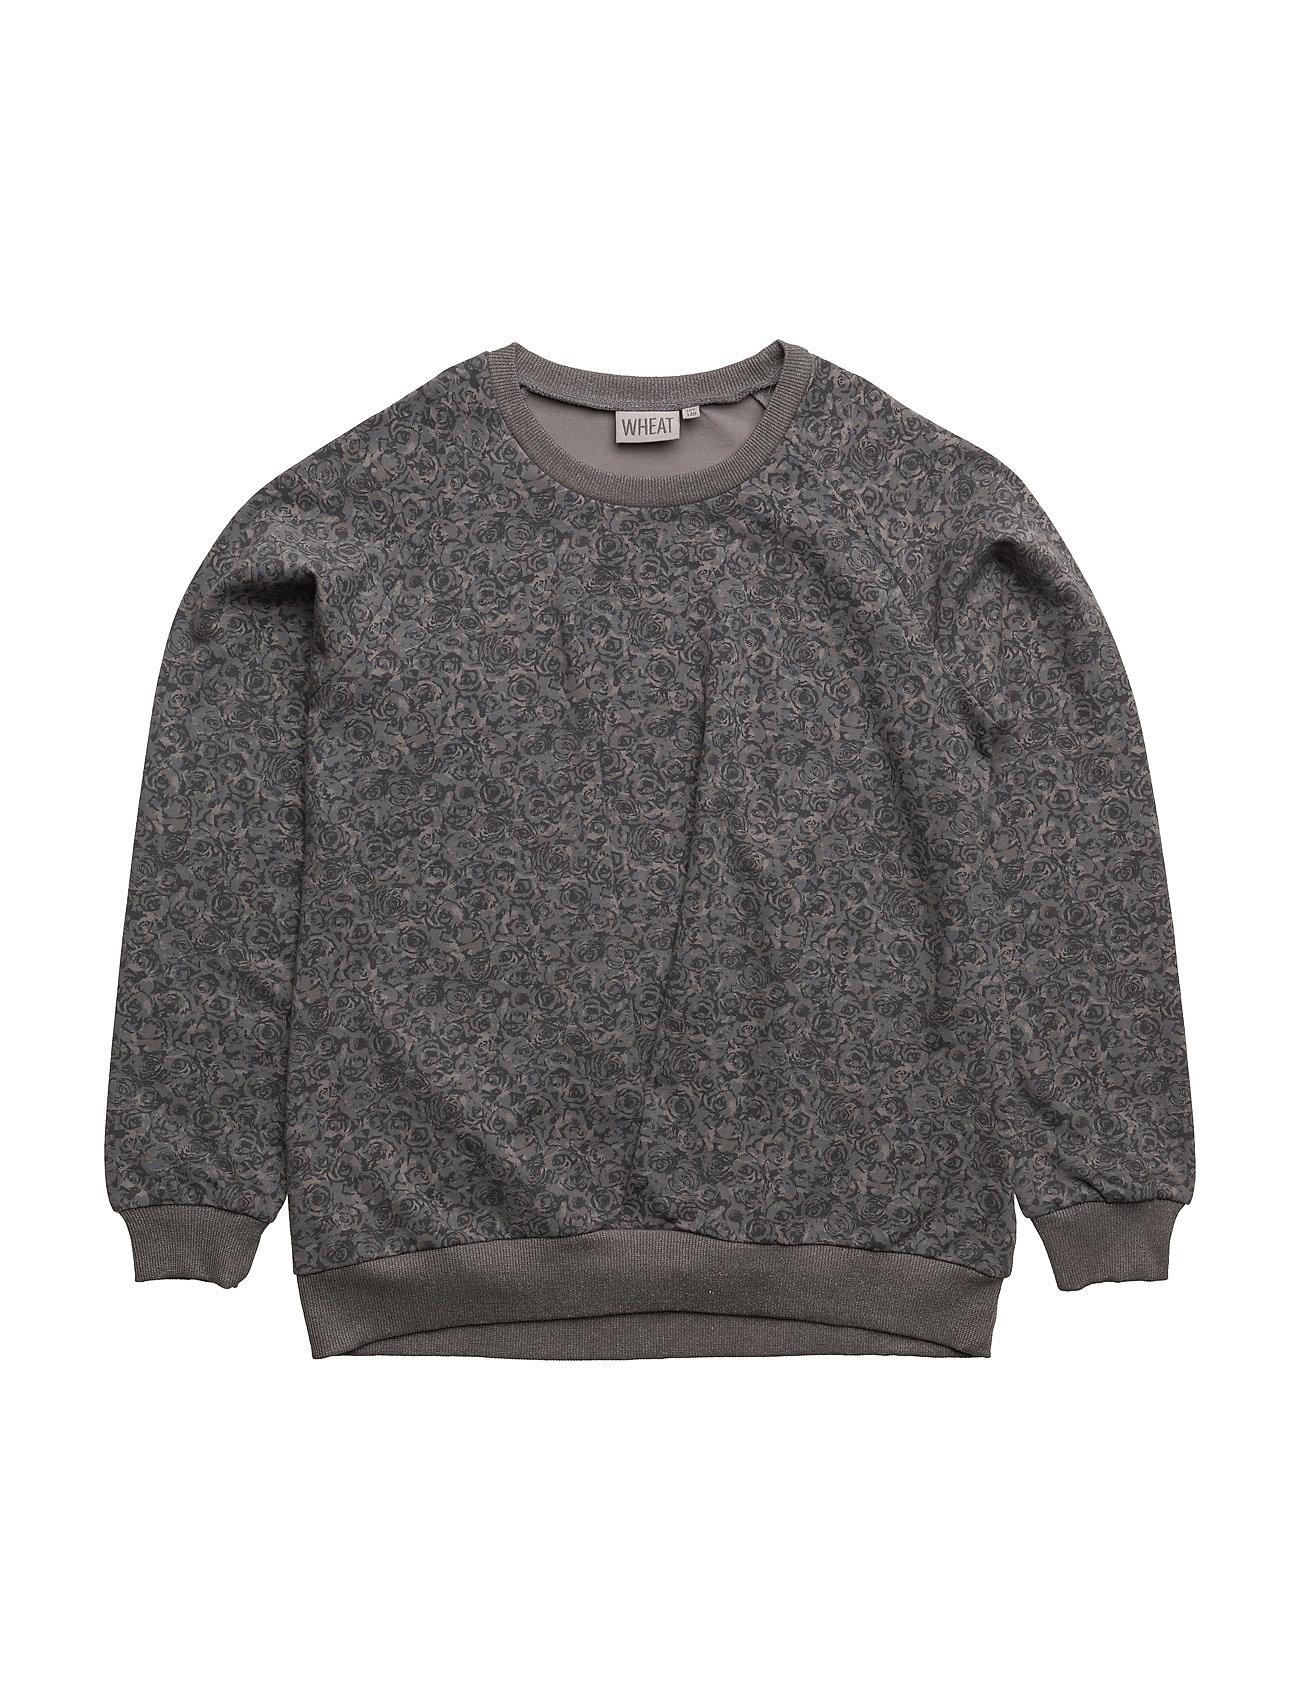 wheat – Sweatshirt lulu på boozt.com dk